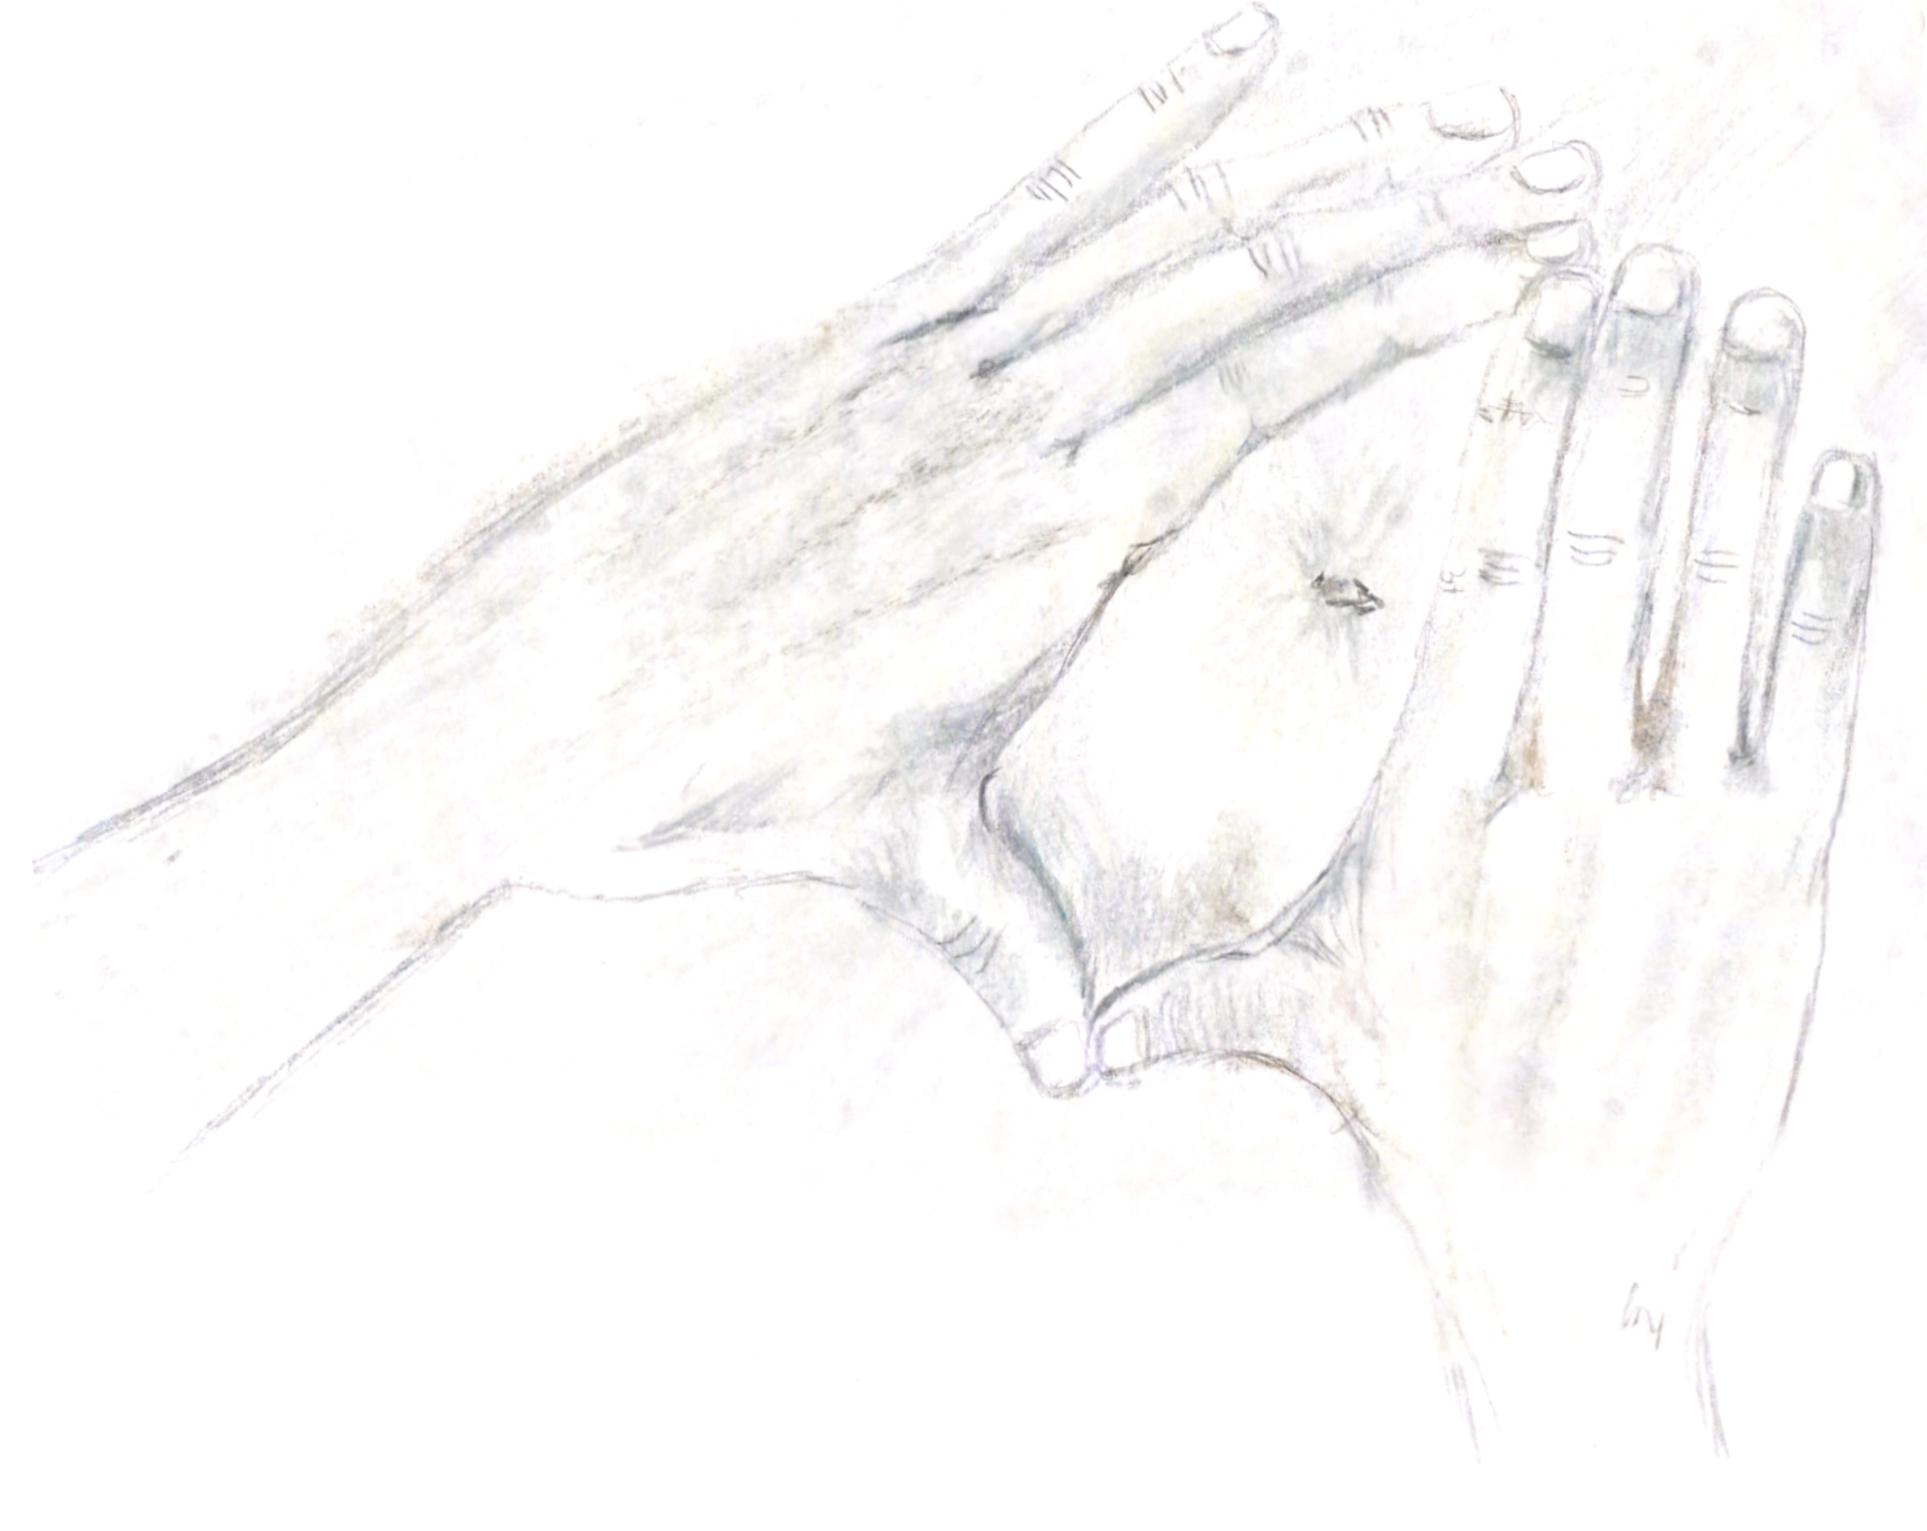 MAIN 5